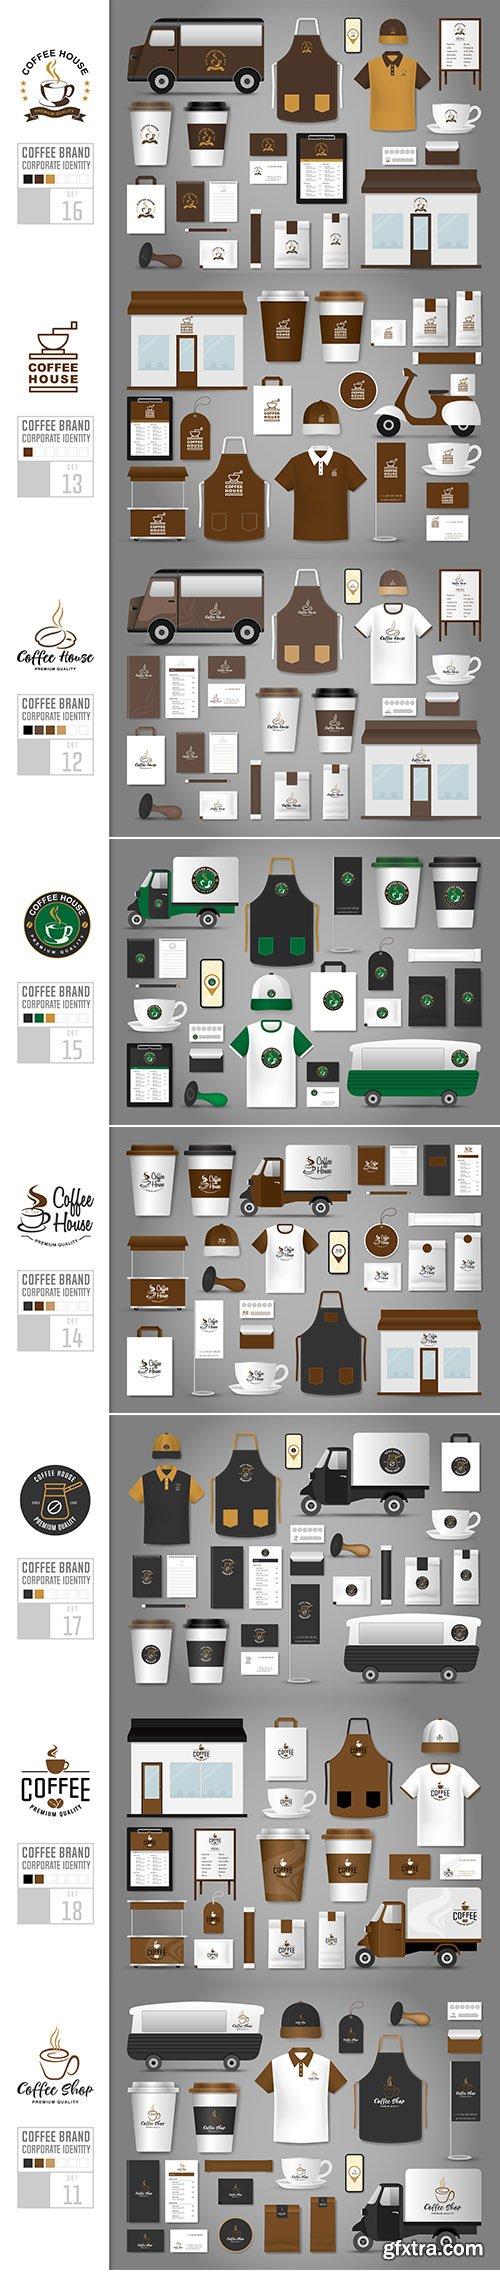 Corporate Identity Vector Template Coffee Shop Set